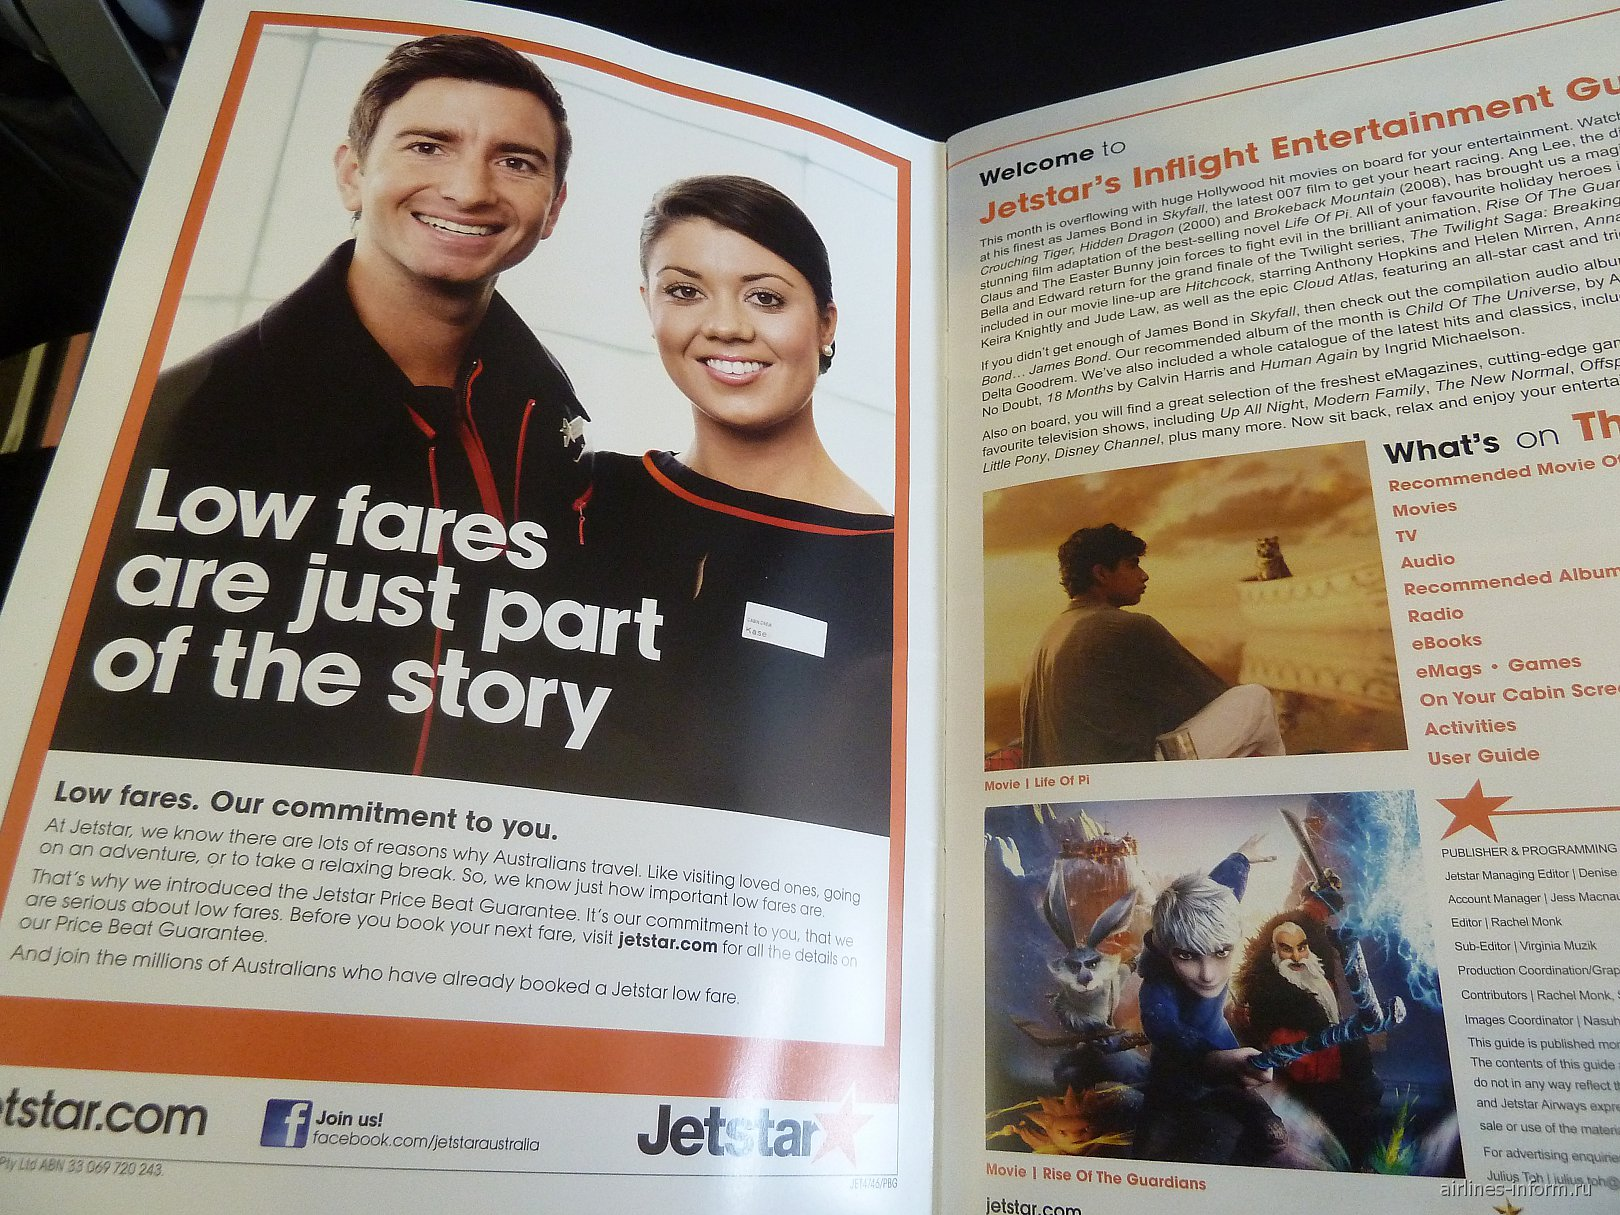 Журнал для пассажиров авиакомпании JetStar